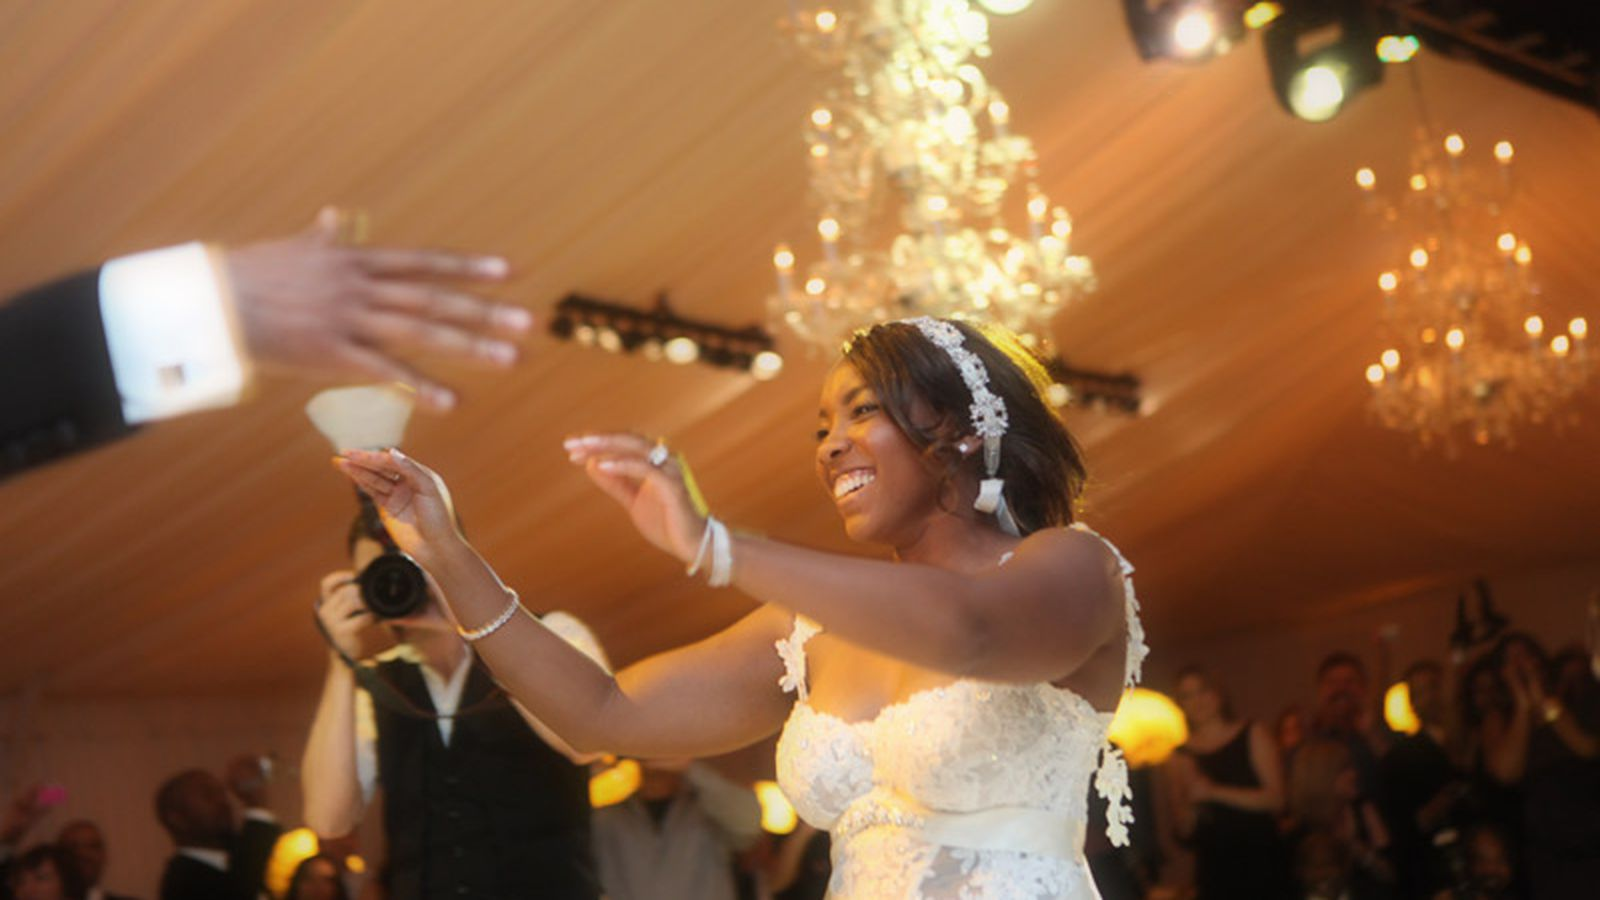 Tony Gwynns Daughters Wedding was expensive  Gaslamp Ball